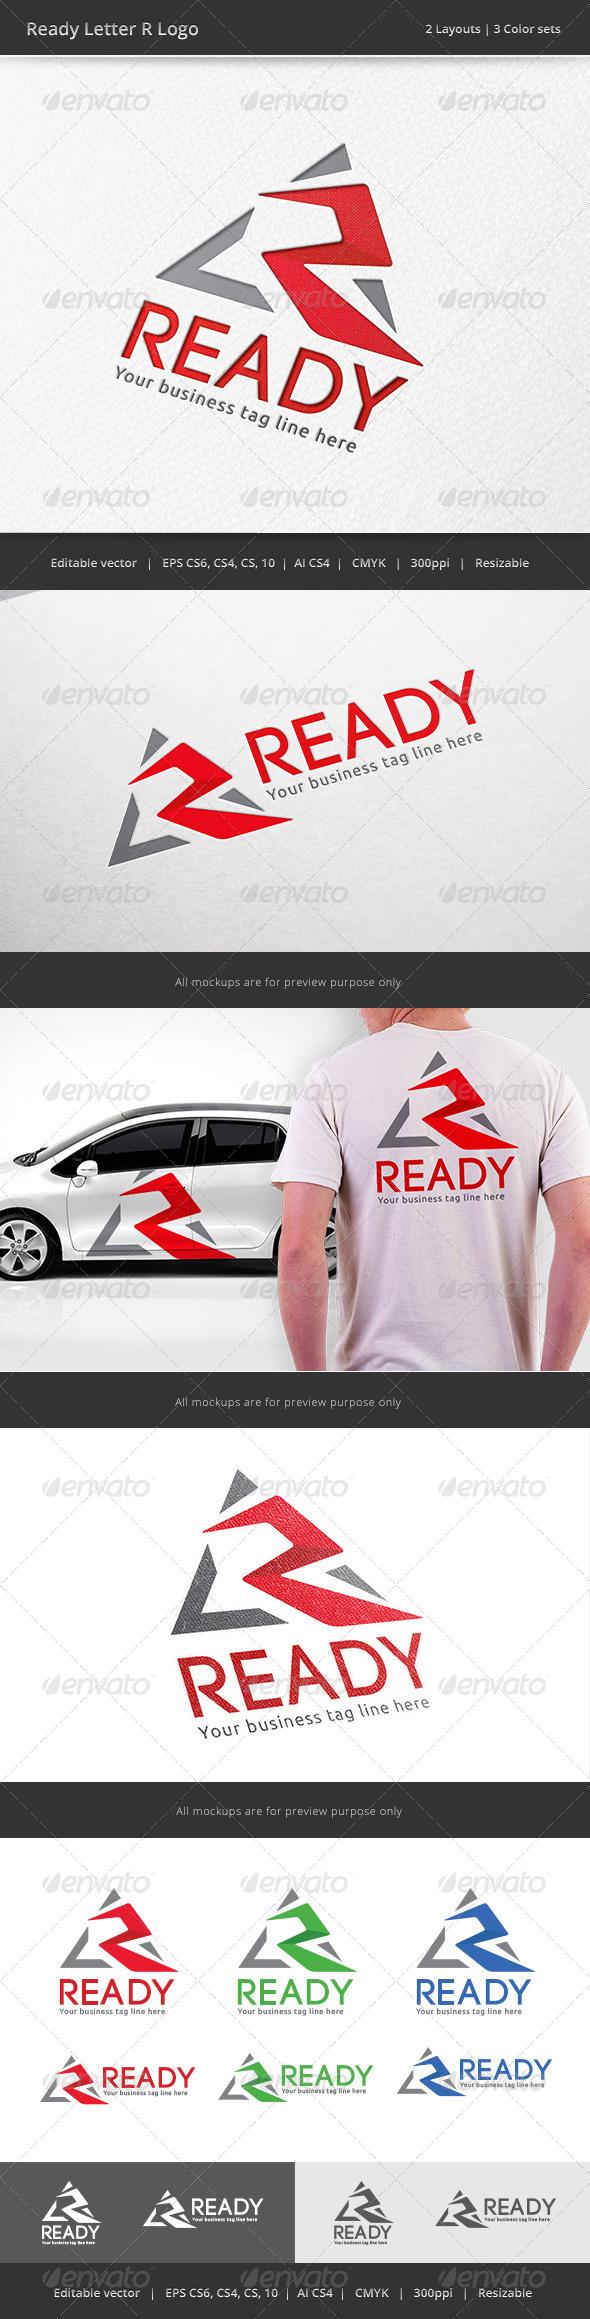 GraphicRiver Ready Letter R V2 Logo 7747095